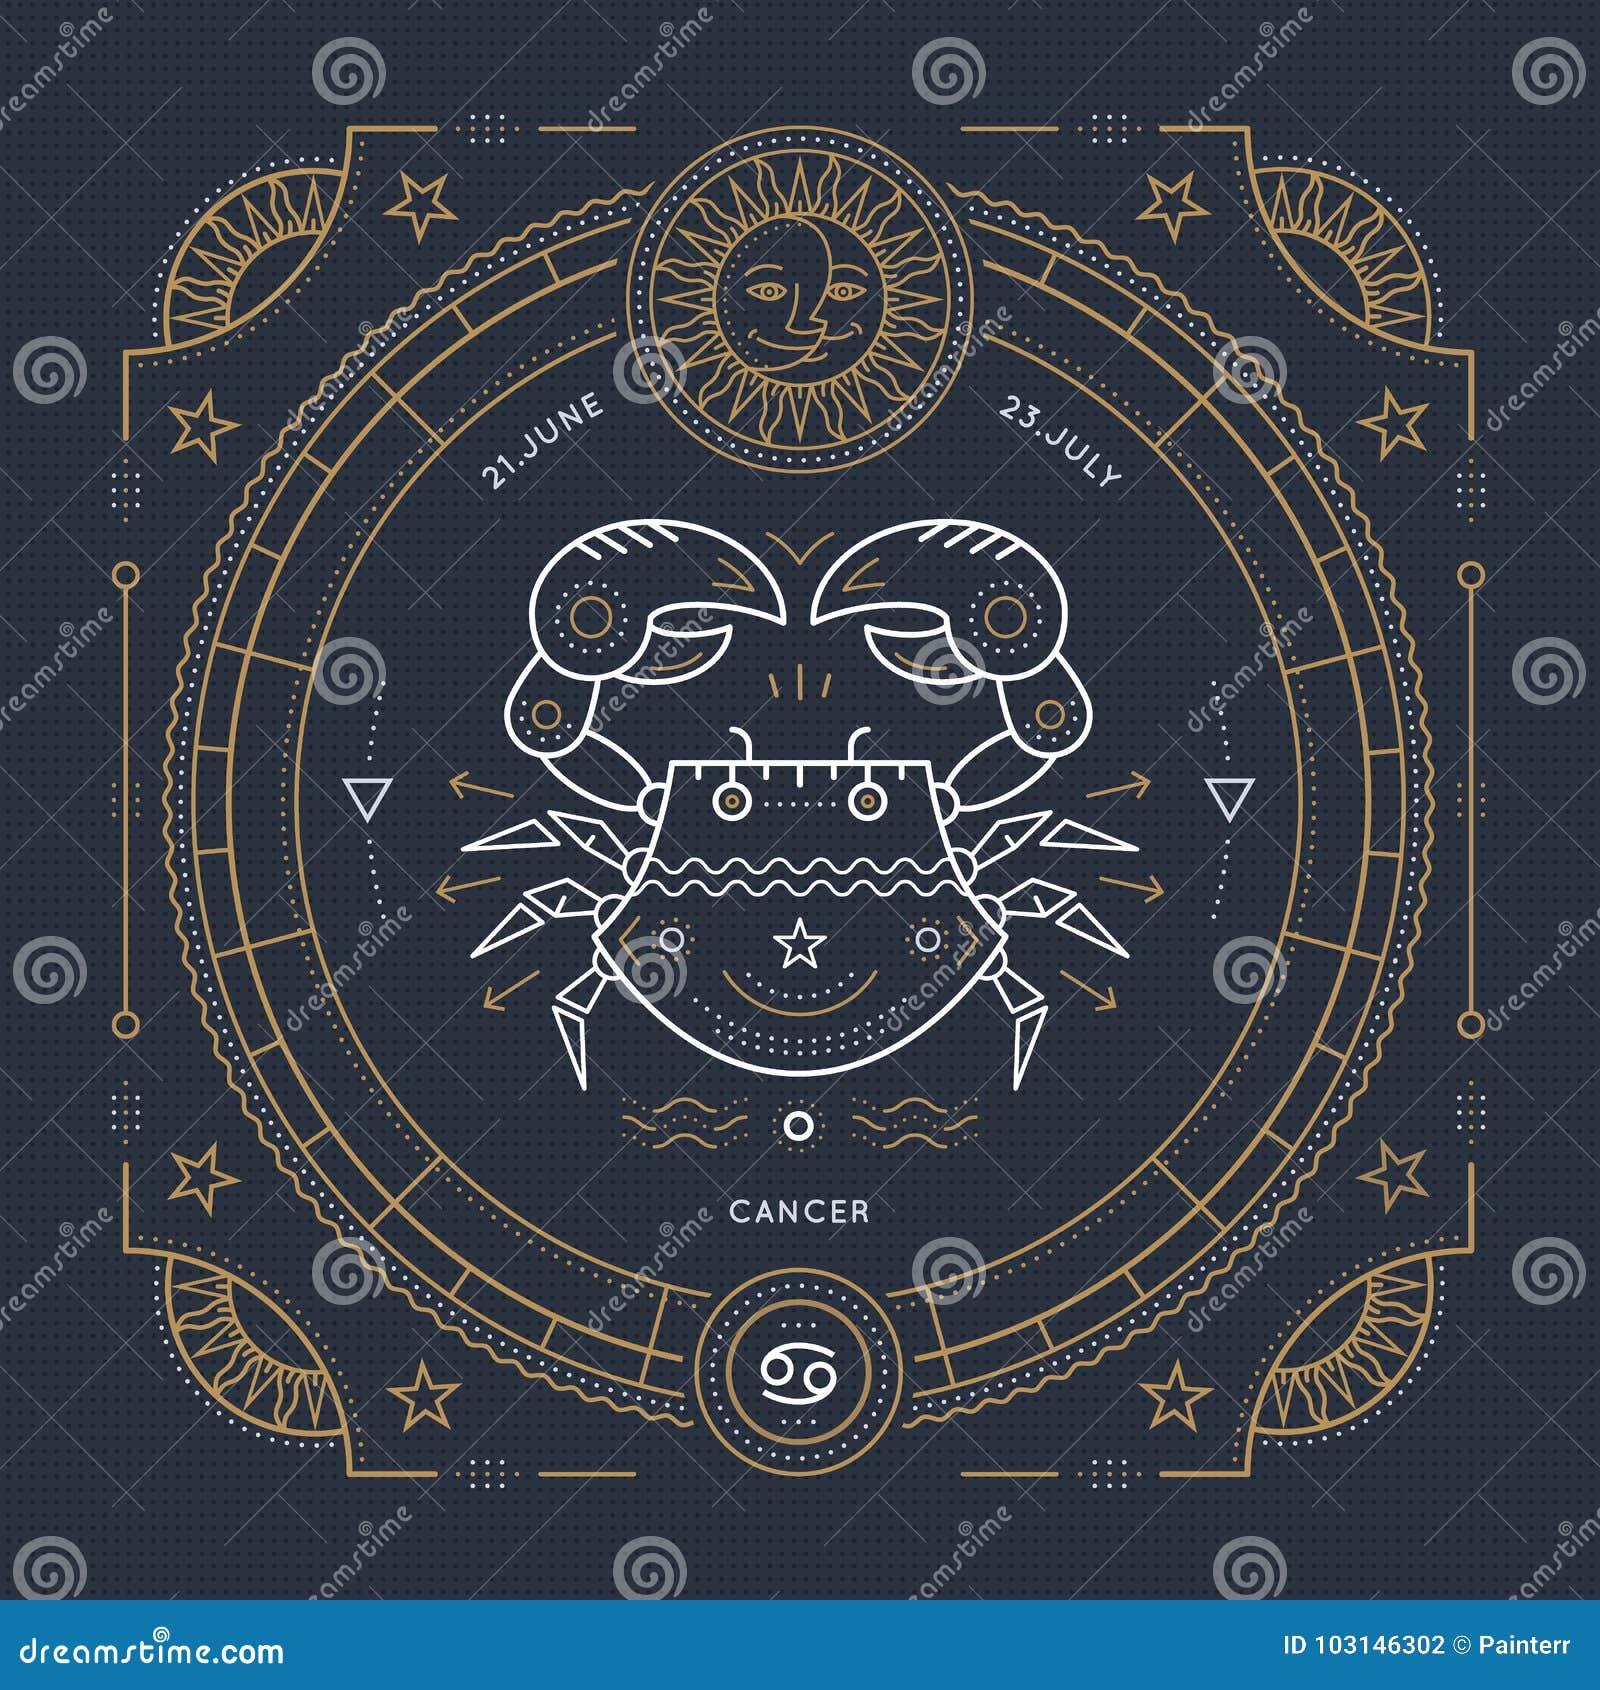 Vintage thin line Cancer zodiac sign label. Retro vector astrological symbol, mystic, sacred geometry element, emblem